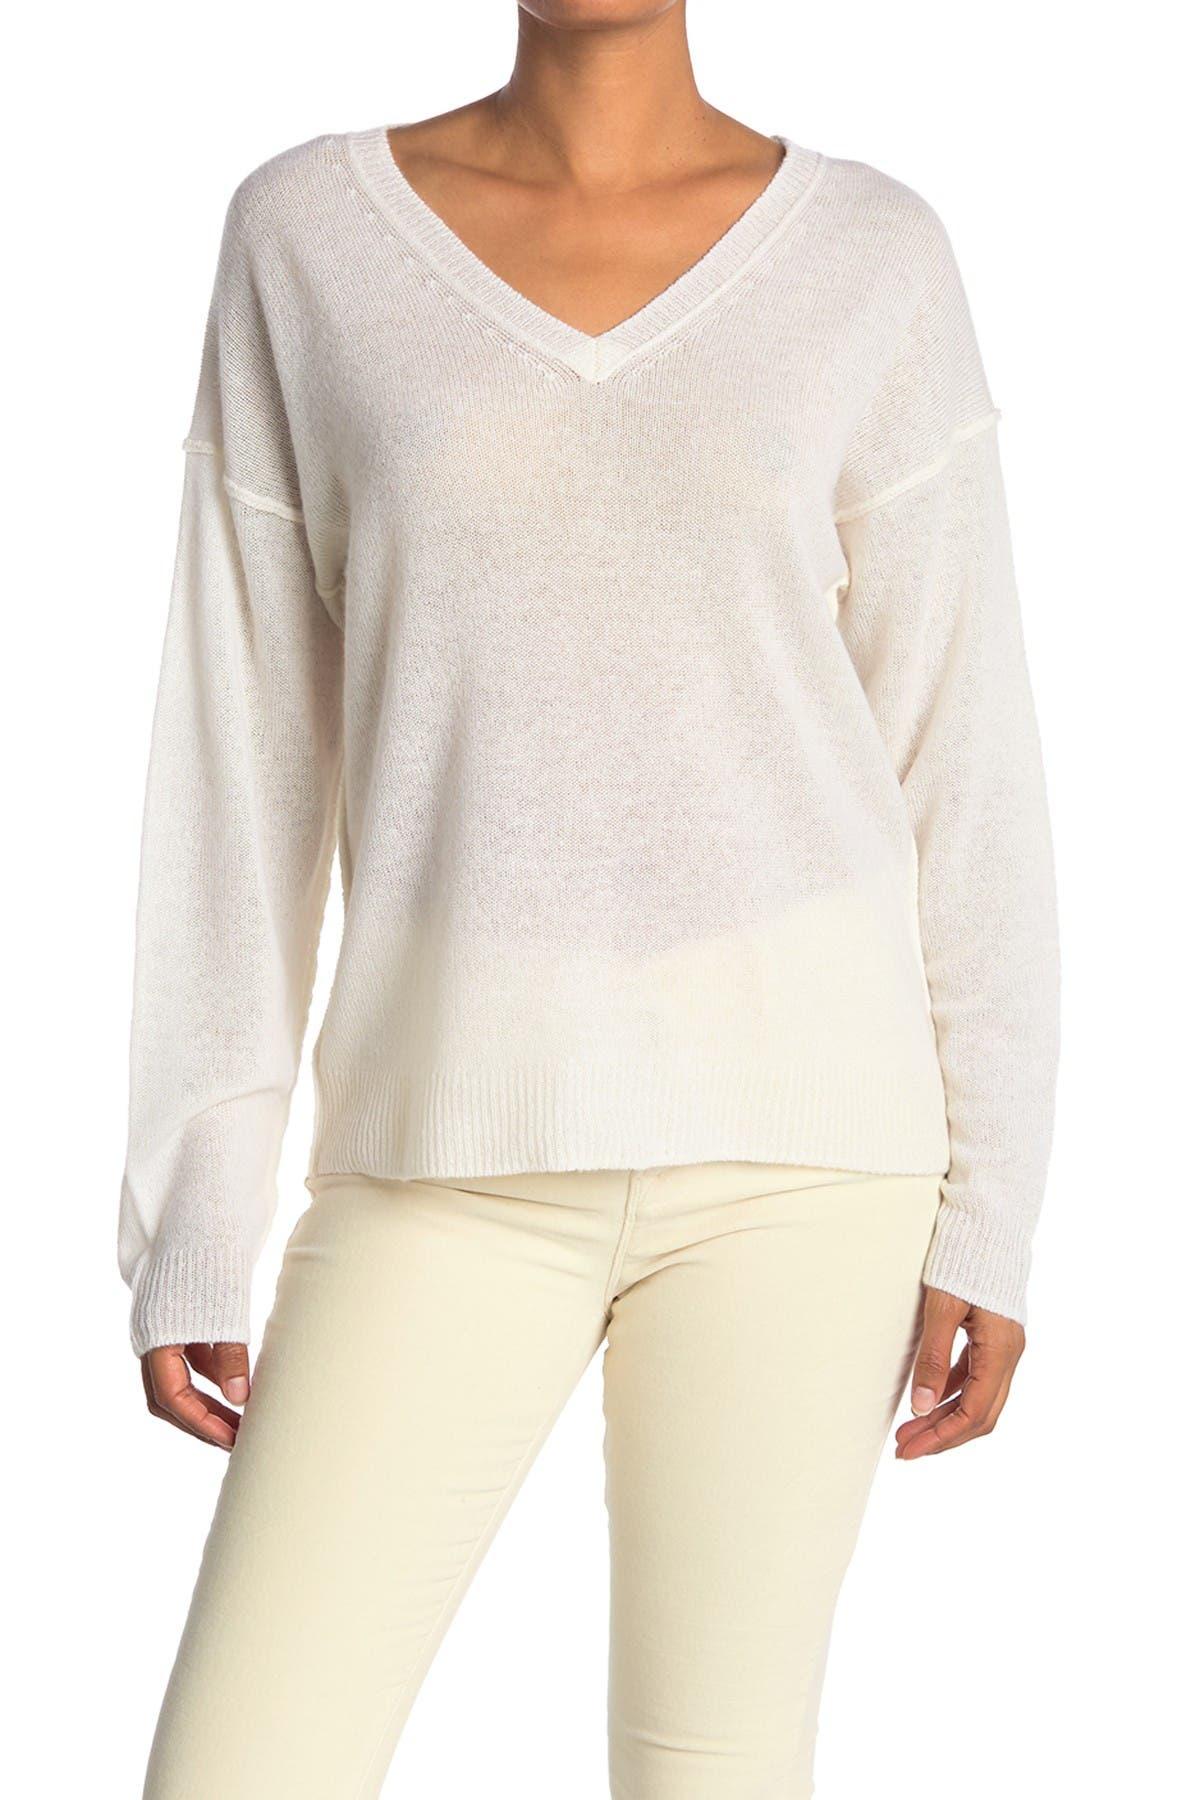 Image of 525 America Lightweight Cashmere V-Neck Sweater